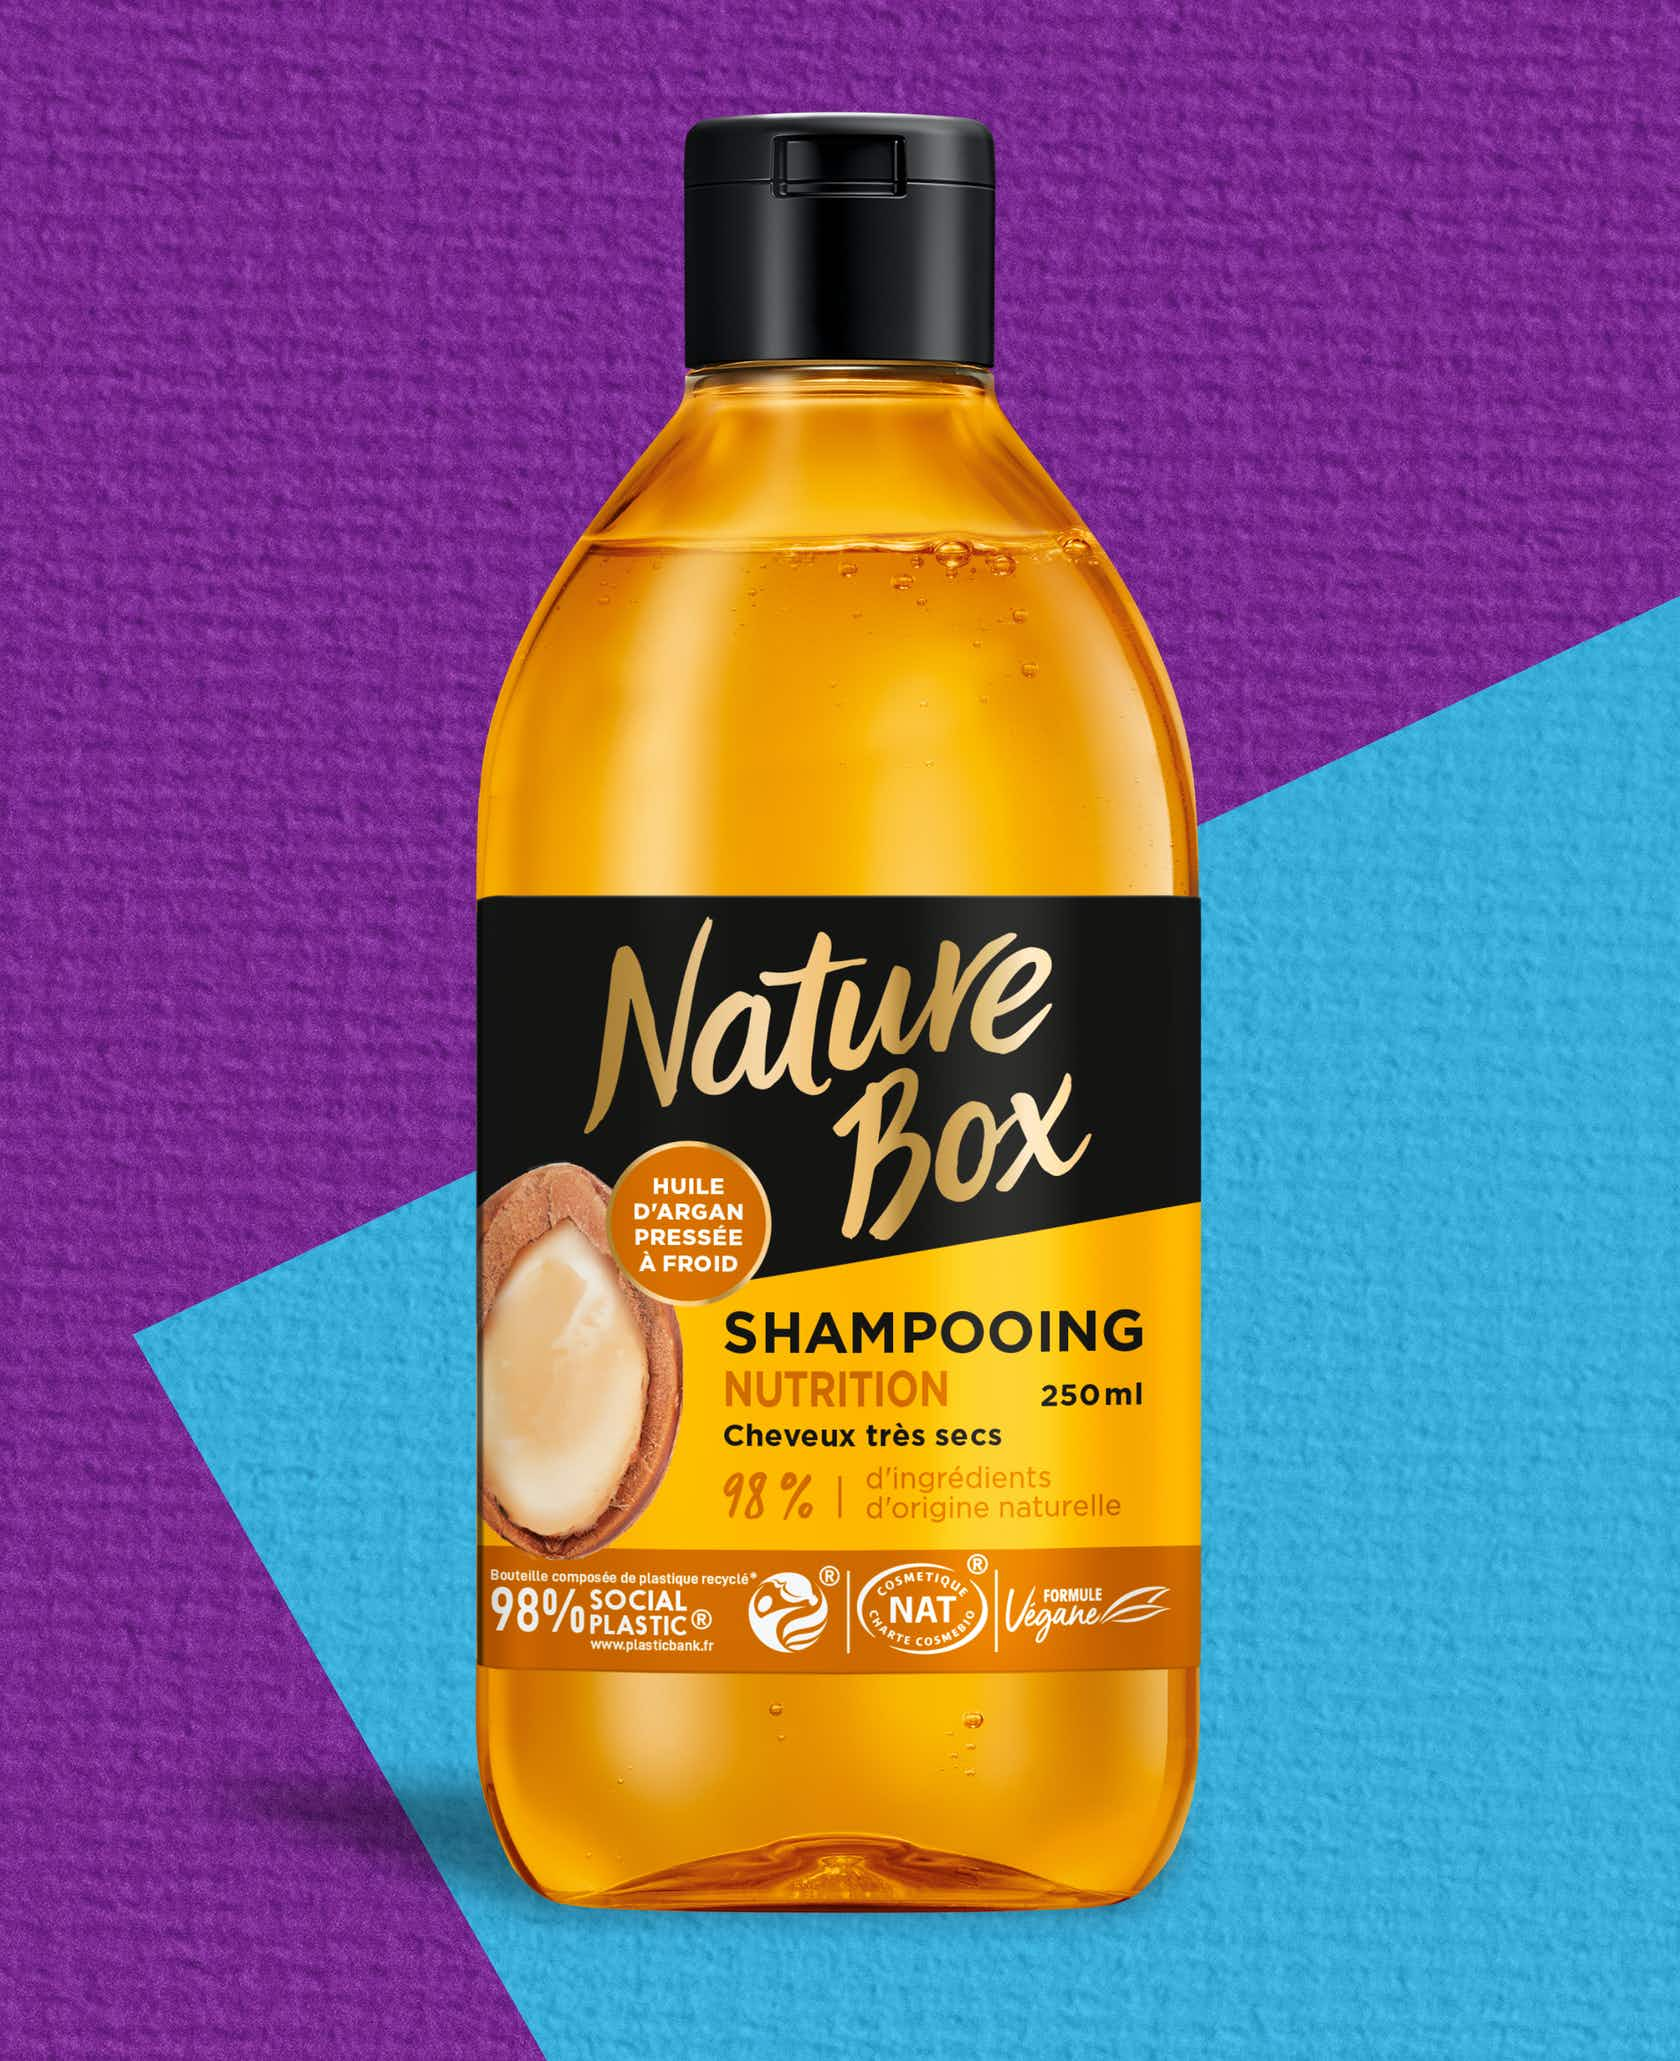 Shampooing liquide